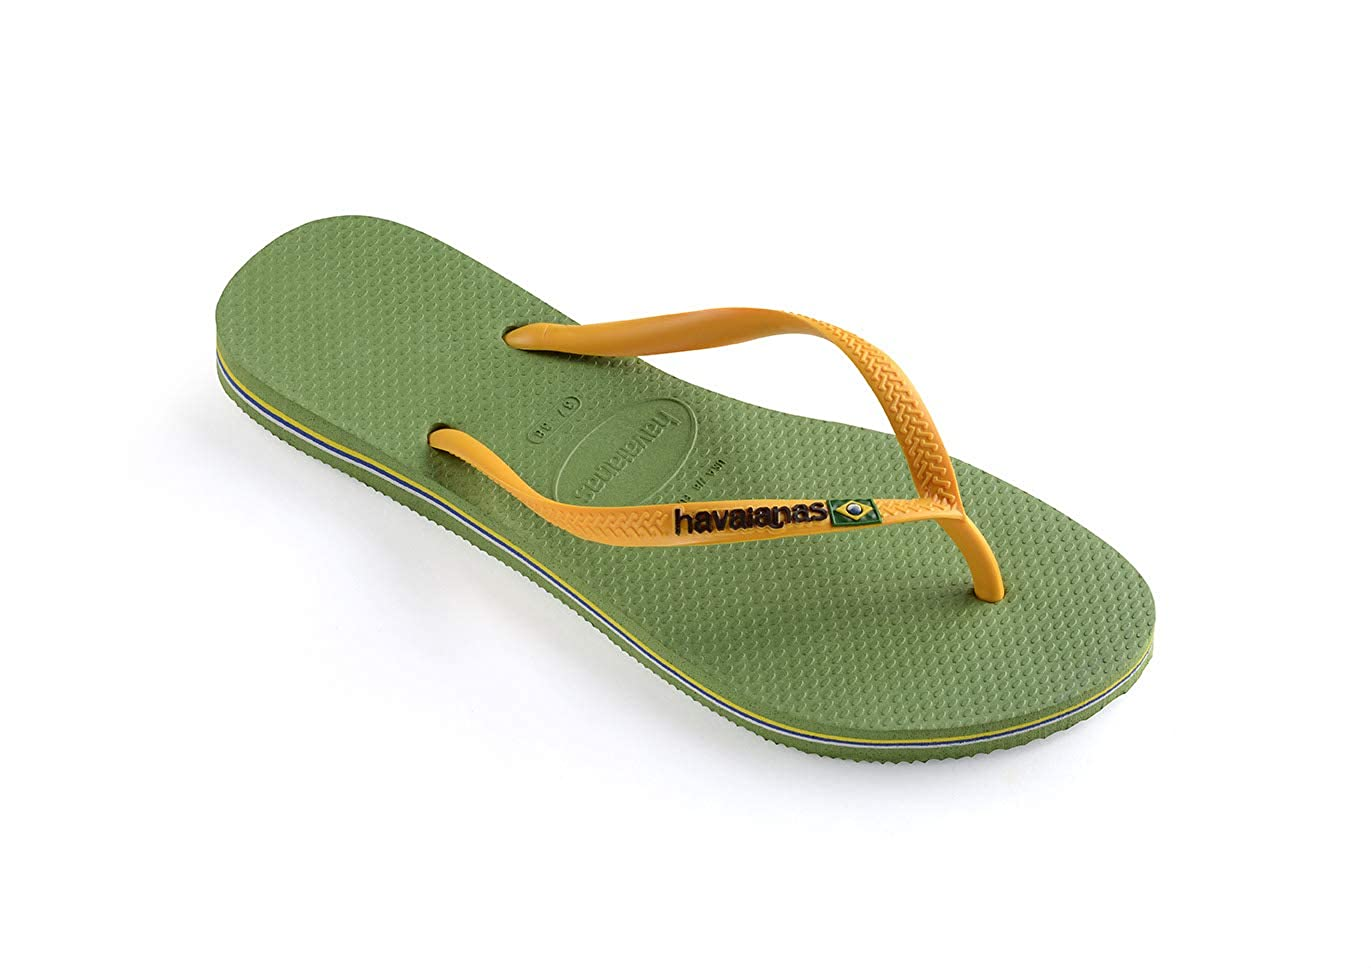 Havaianas Womens Slim Brazil Flip Flop Sandal